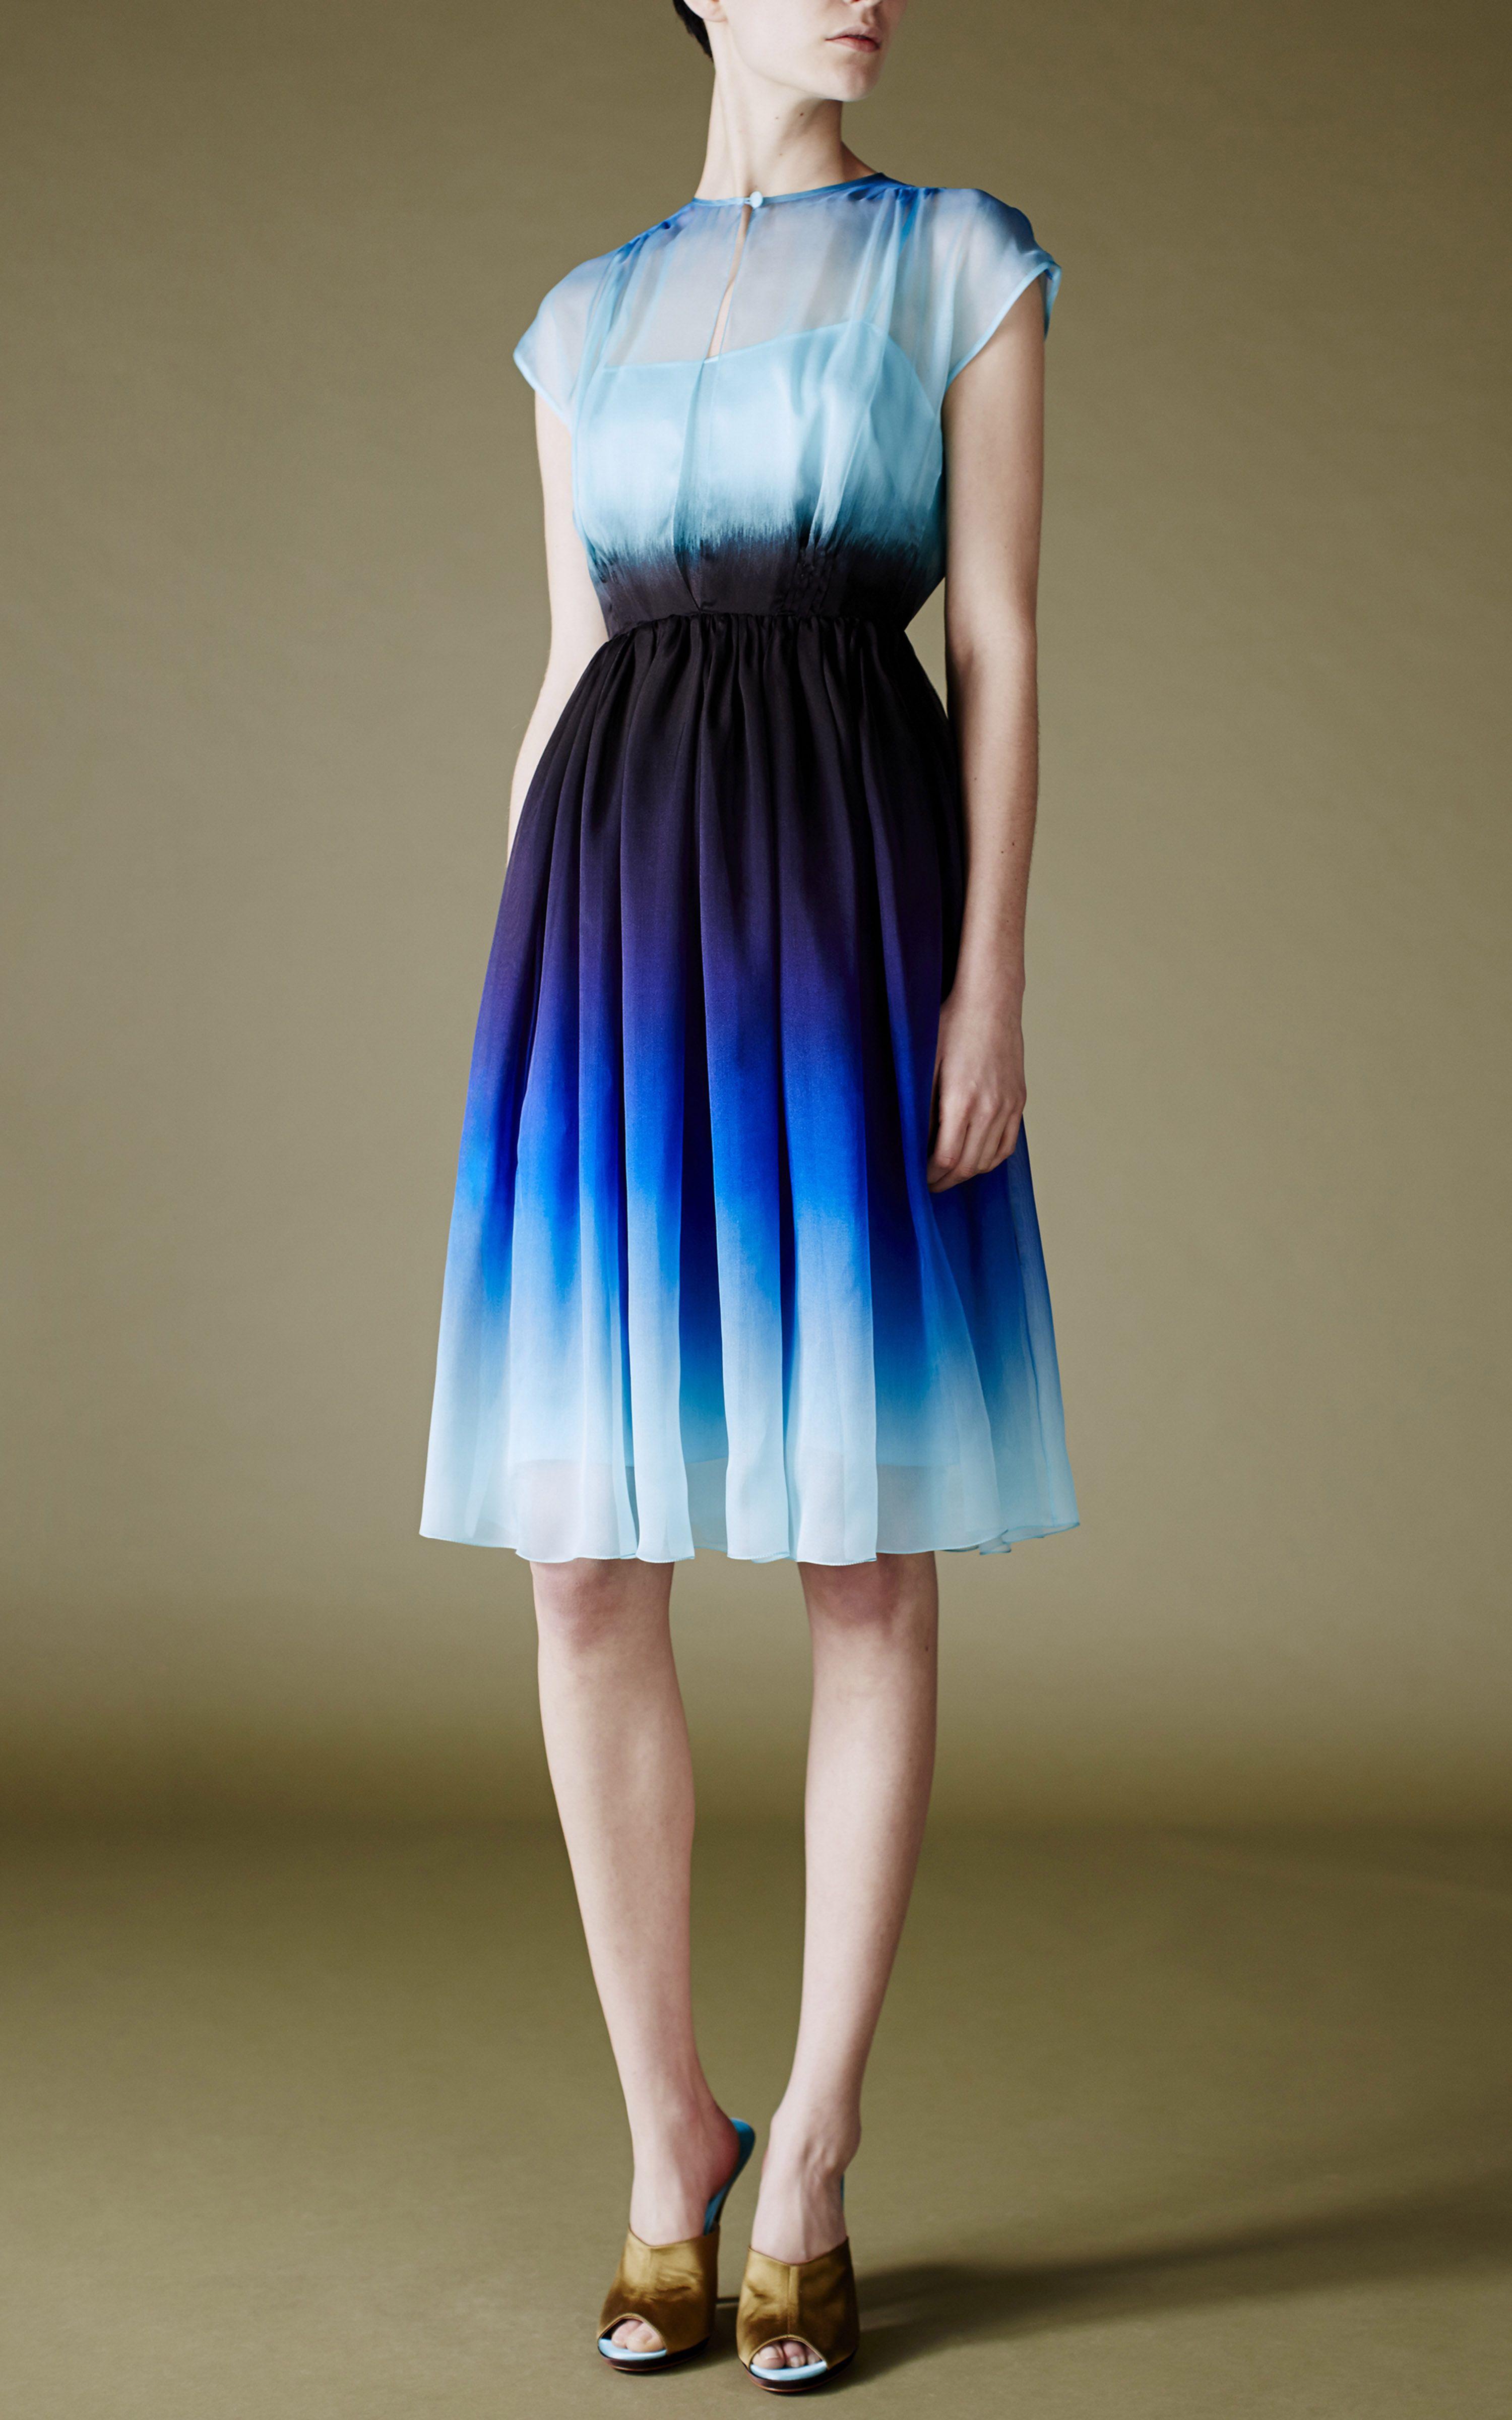 Resultado de imagem para Ombré Dip Dye vestido